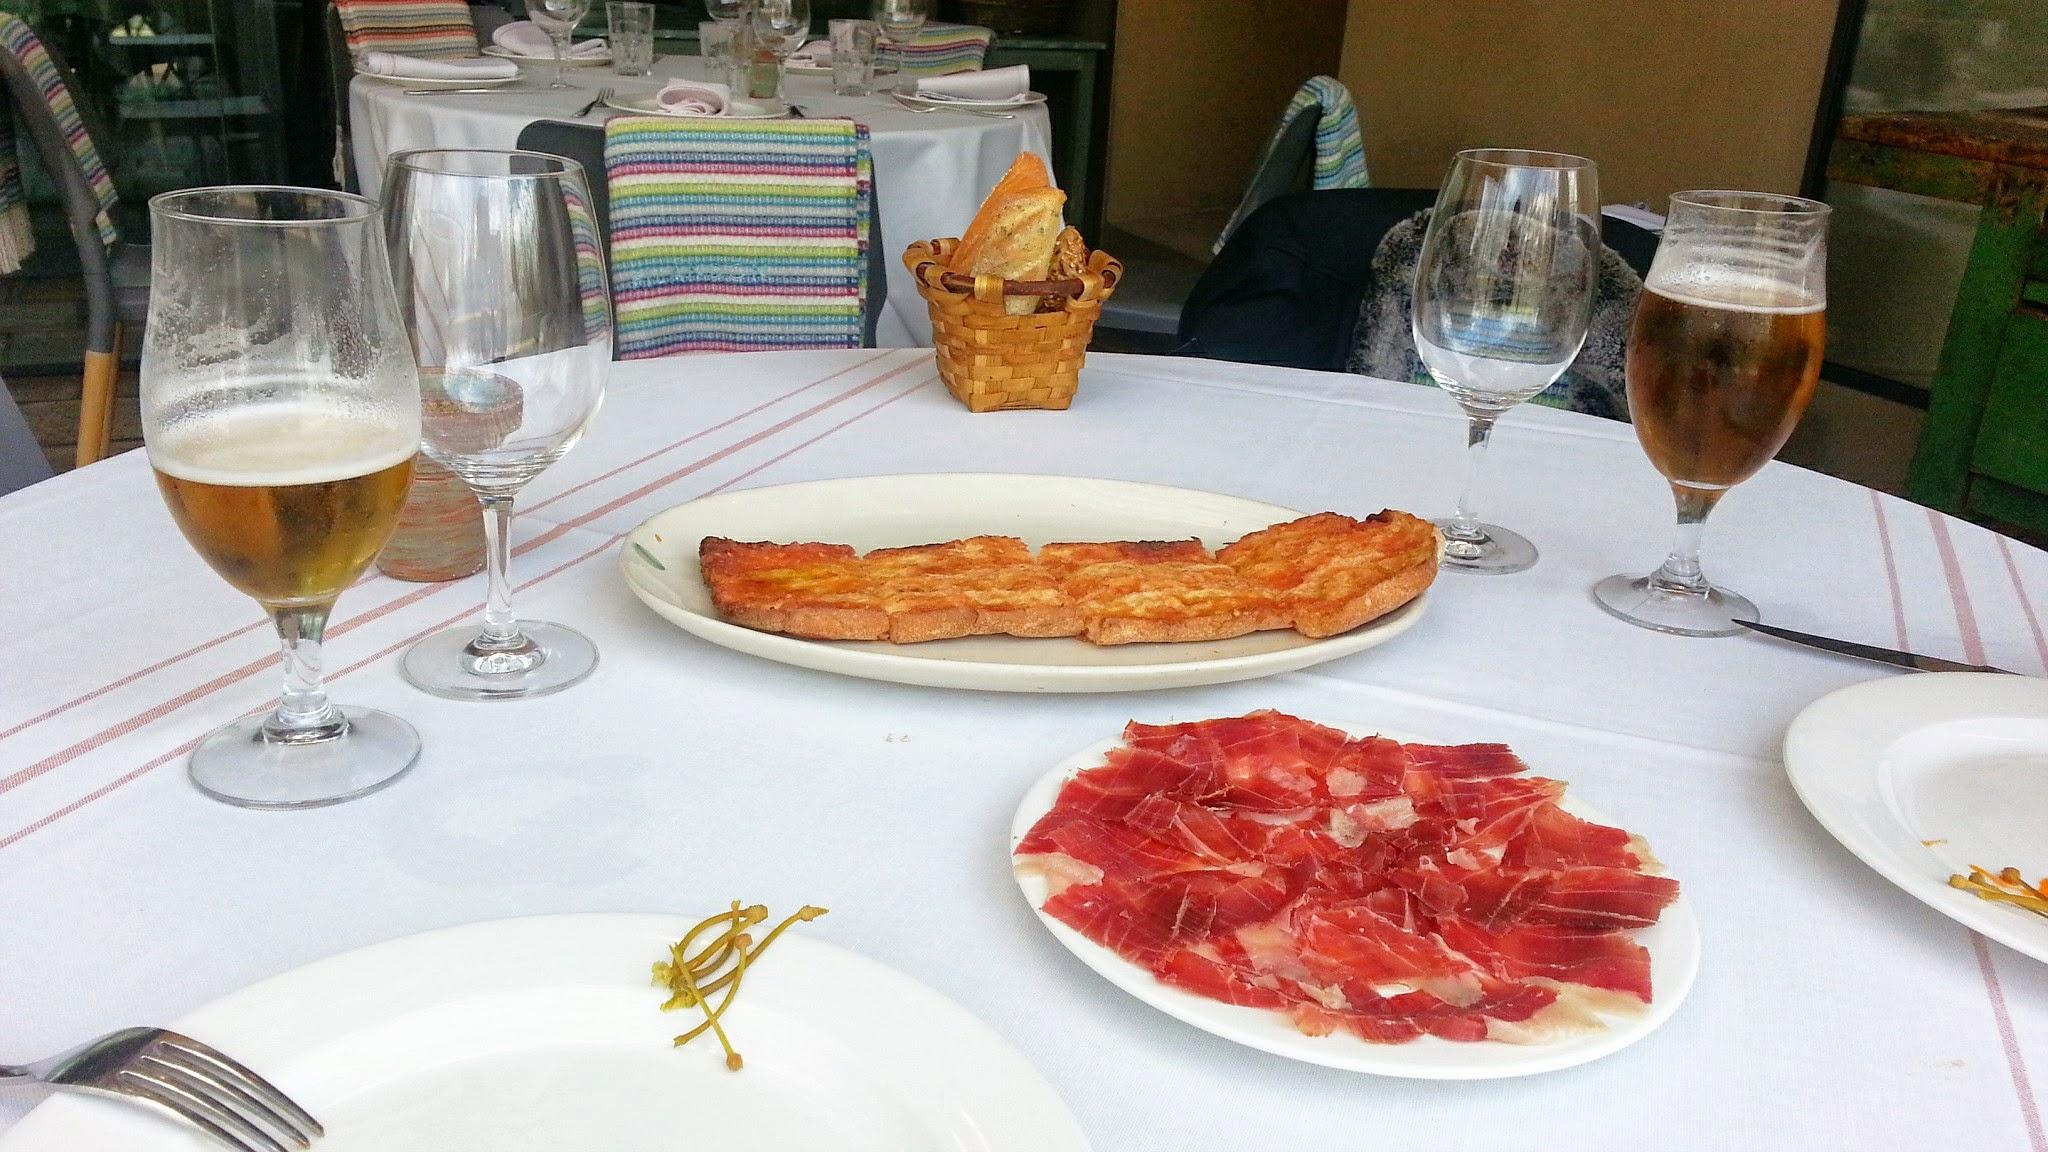 Restaurante Filandón - Media ración de jamón ibérico con pan de cristal